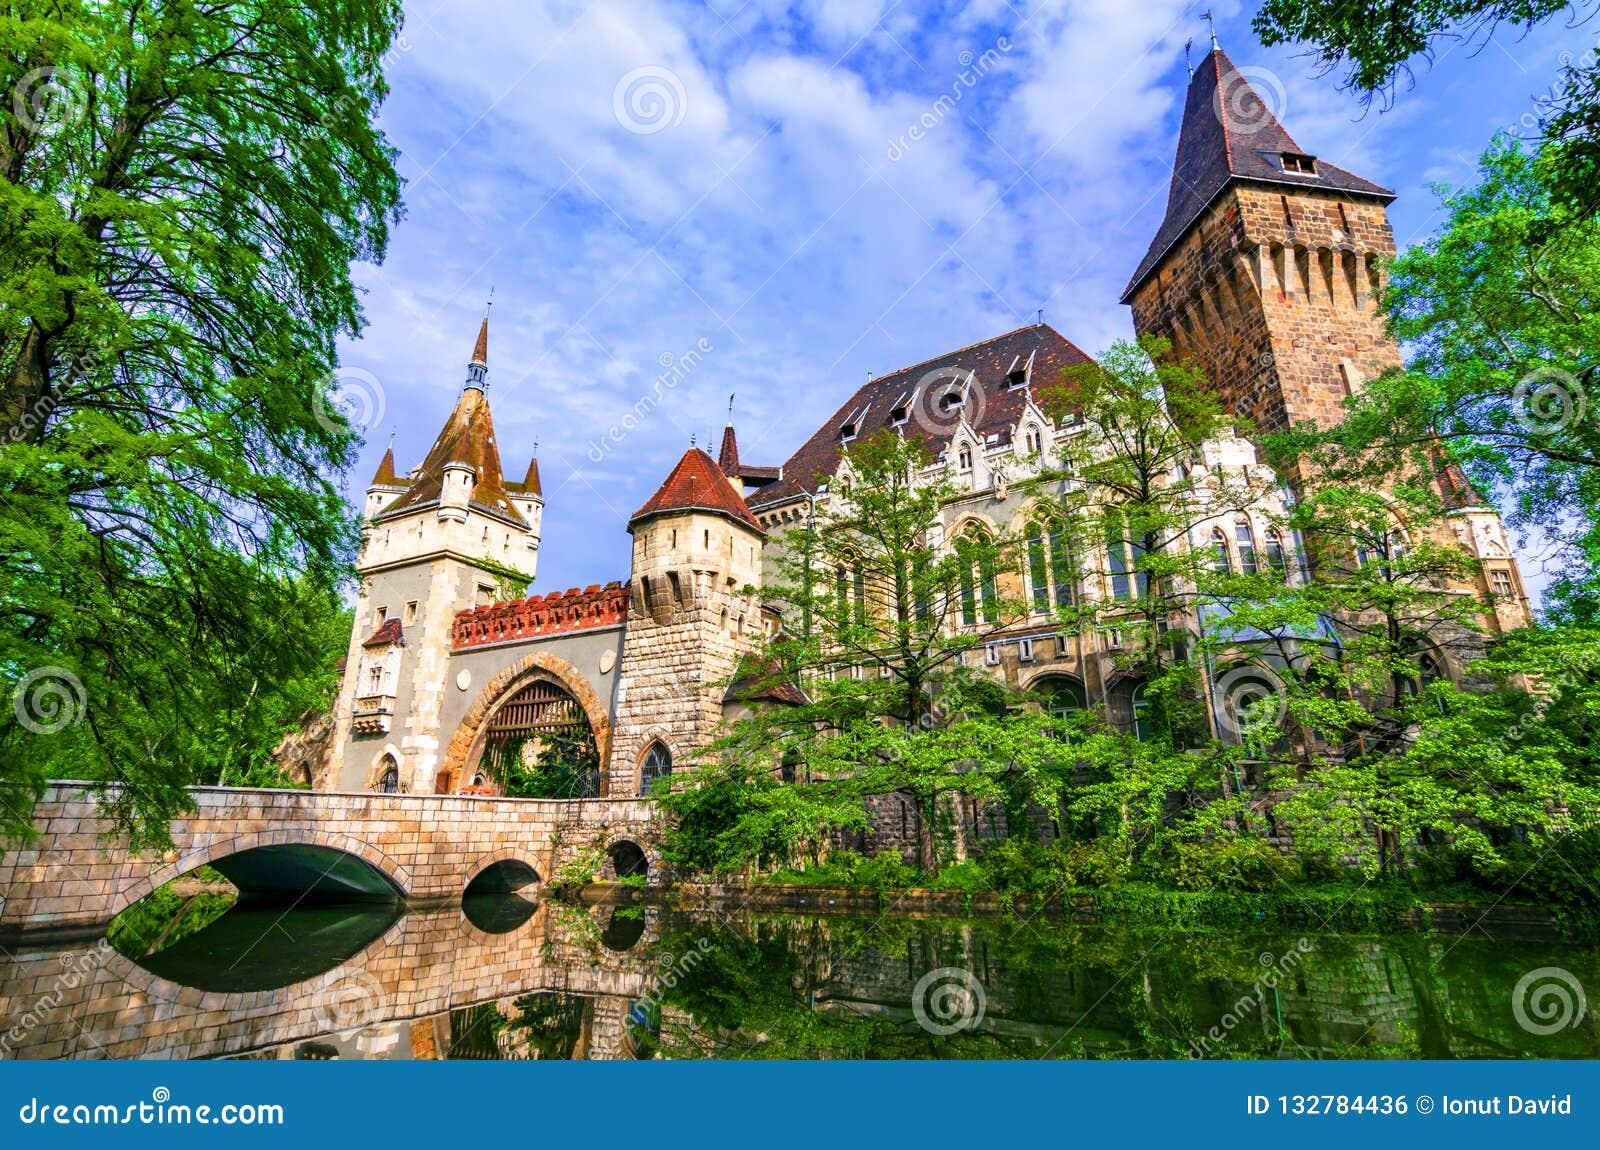 Budapest, Hungary: Vajdahunyad, City Park of Budapest